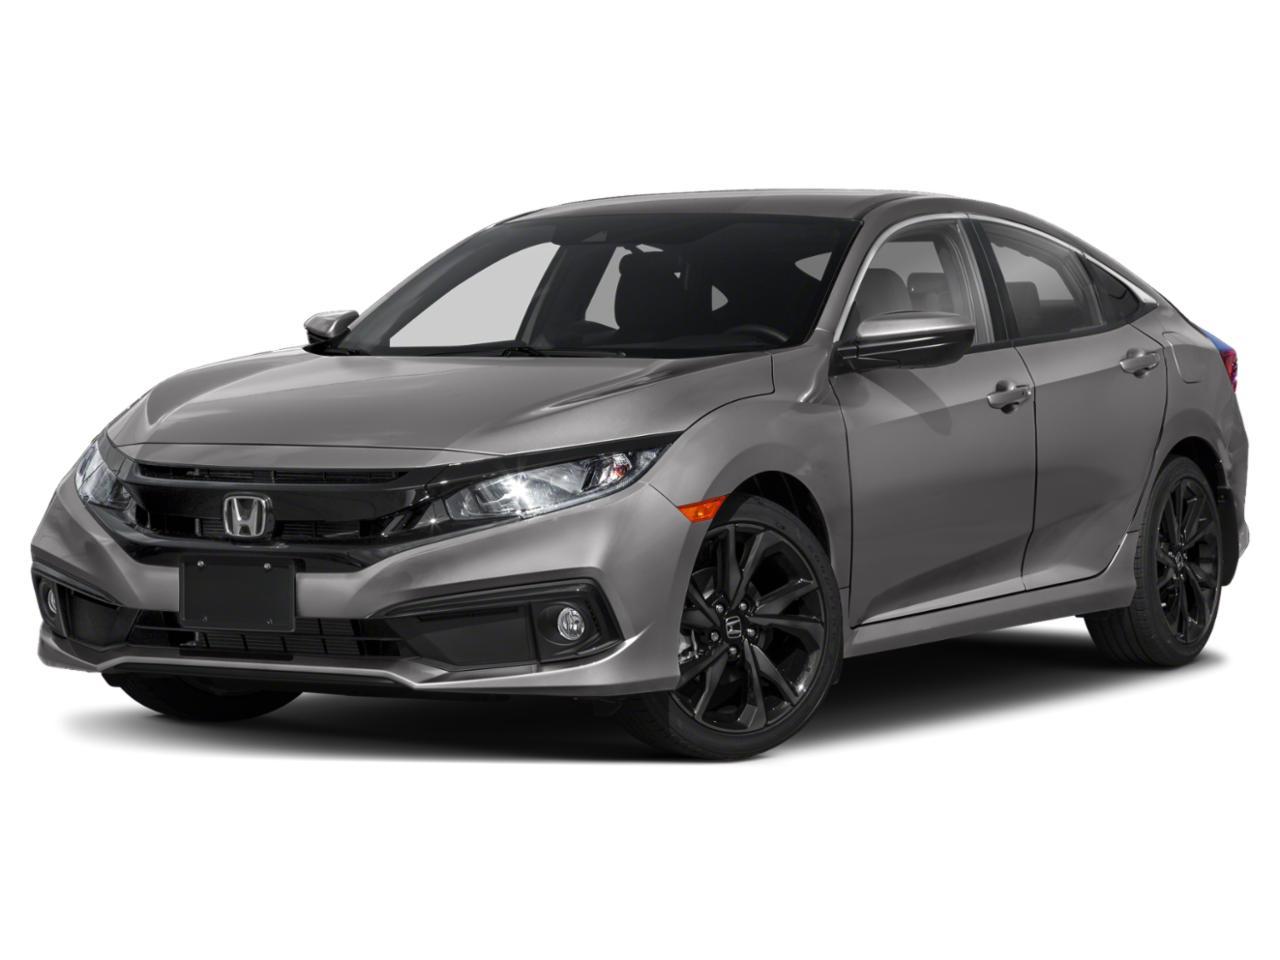 2019 Honda Civic Sedan Vehicle Photo in Odessa, TX 79762